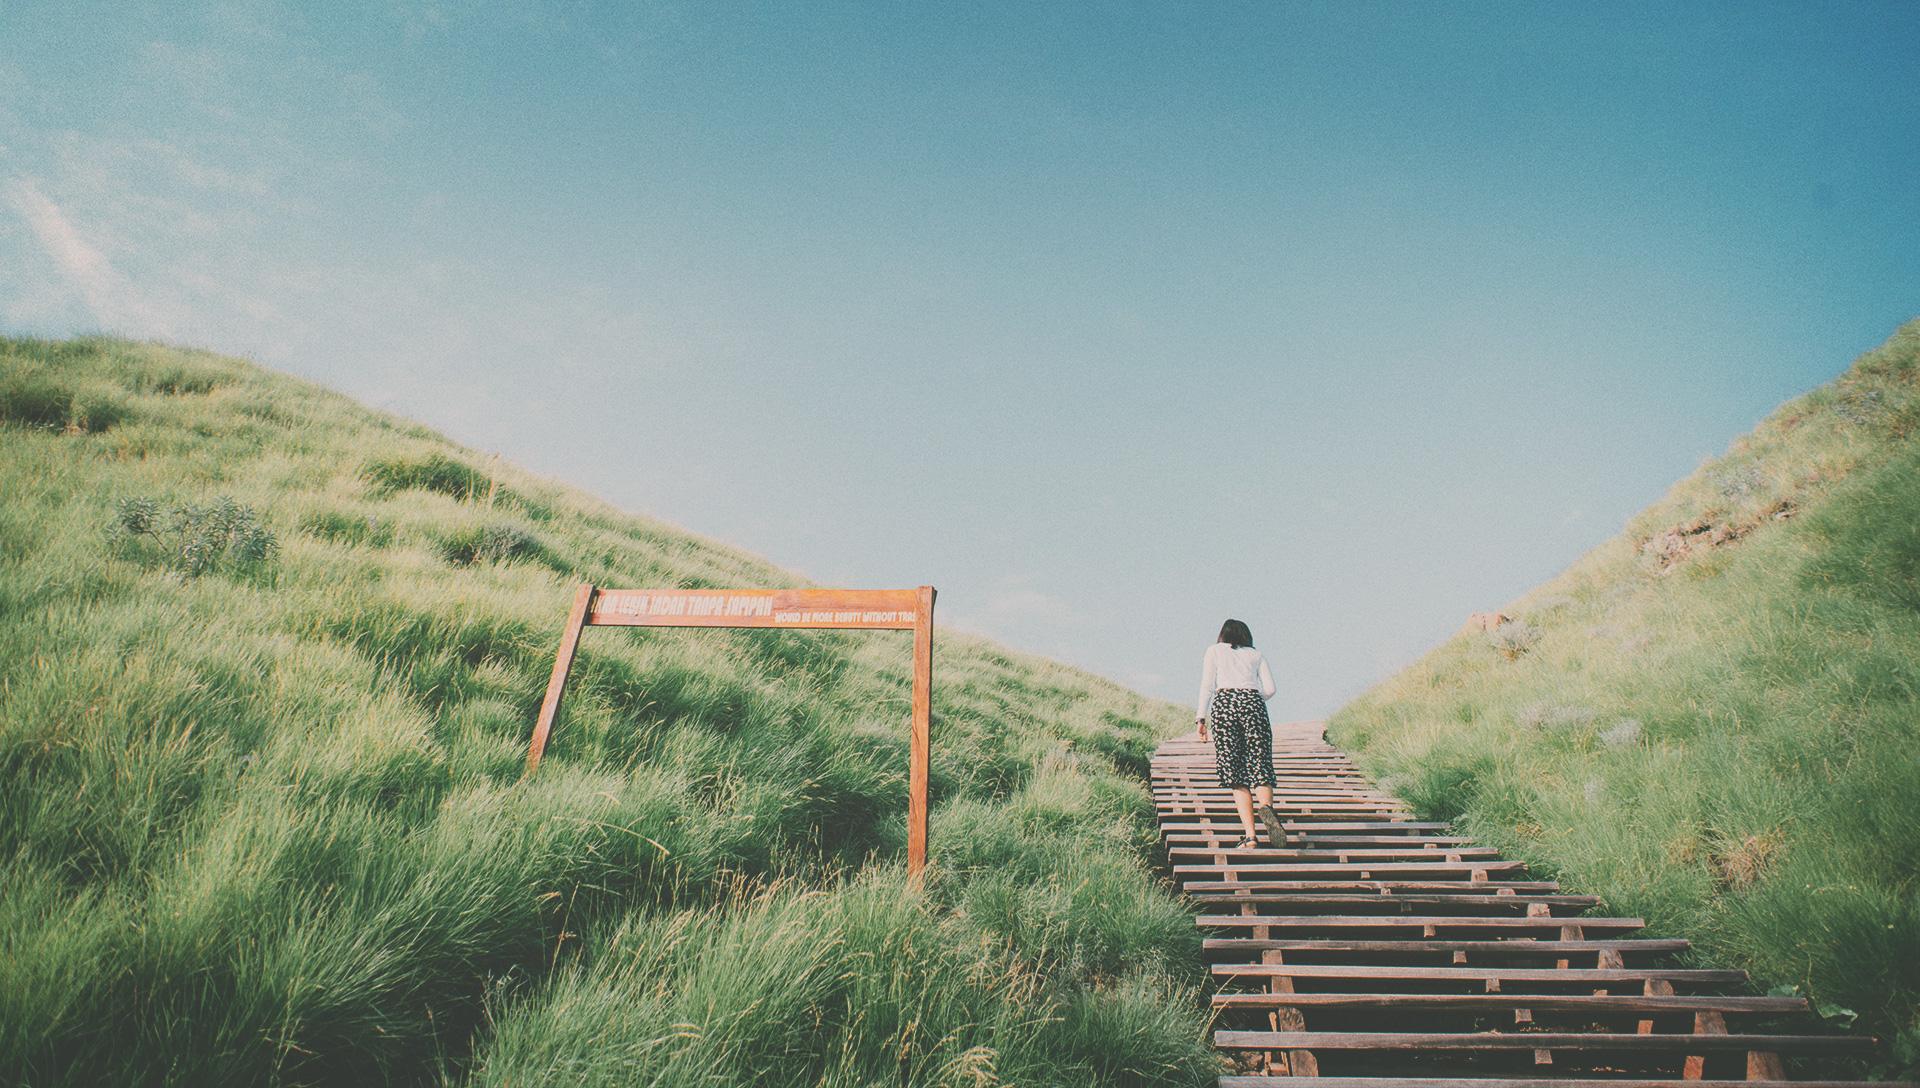 Biblical Theology: Traversing Terrain